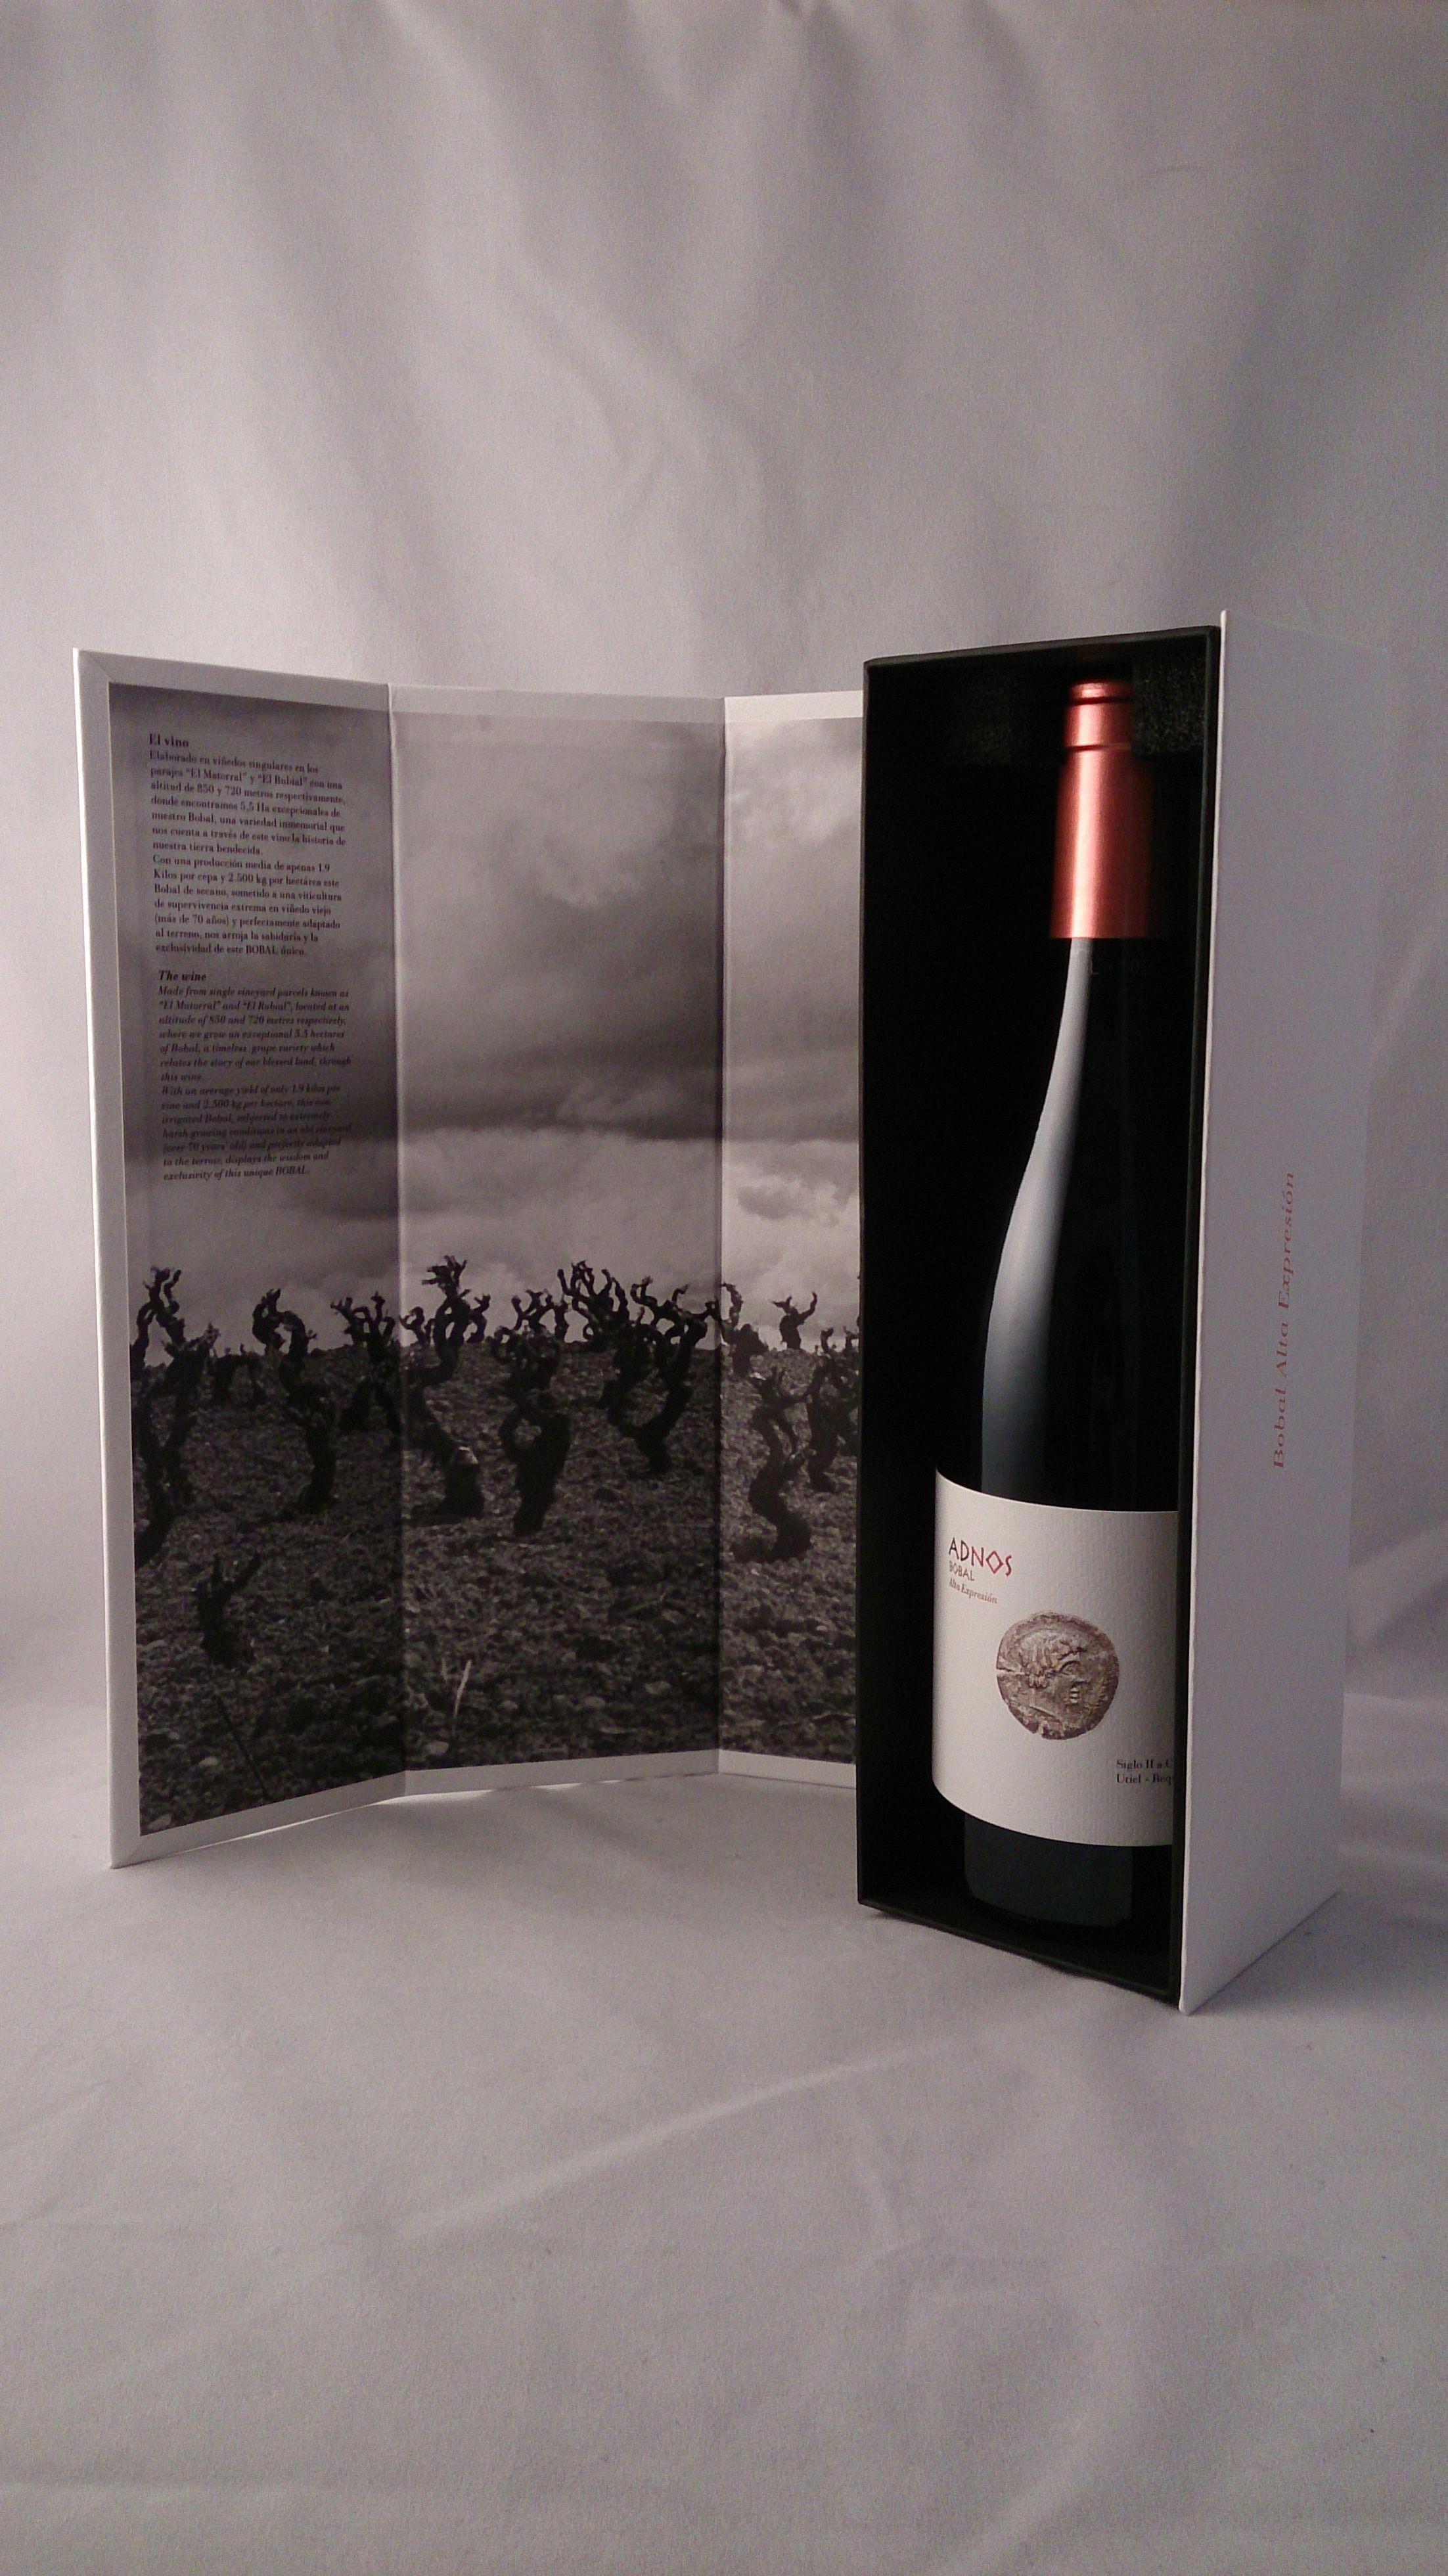 Luxury Wine Decanter Winedealsfreeshipping Post 2533854755 Pinotnoirwine Wine Packaging Design Wine Bottle Packaging Wine Bottle Design